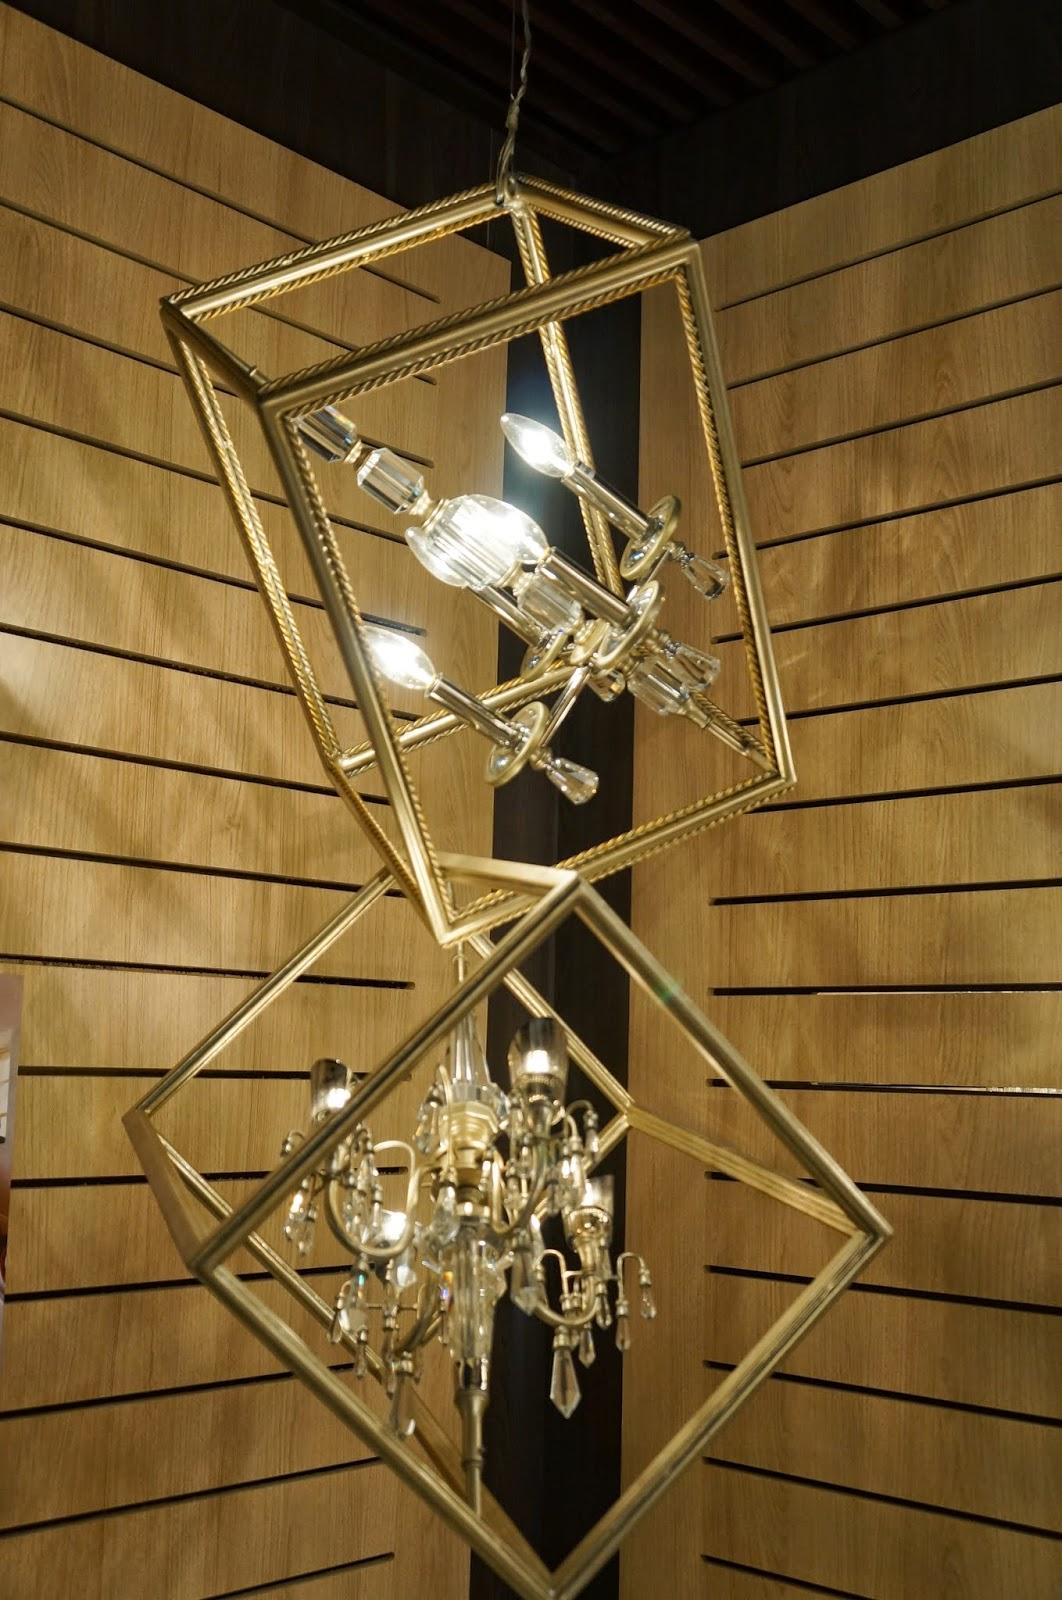 pendente Houdini de ferro forjado à mão - Corbett Lighting - Expolux 2014